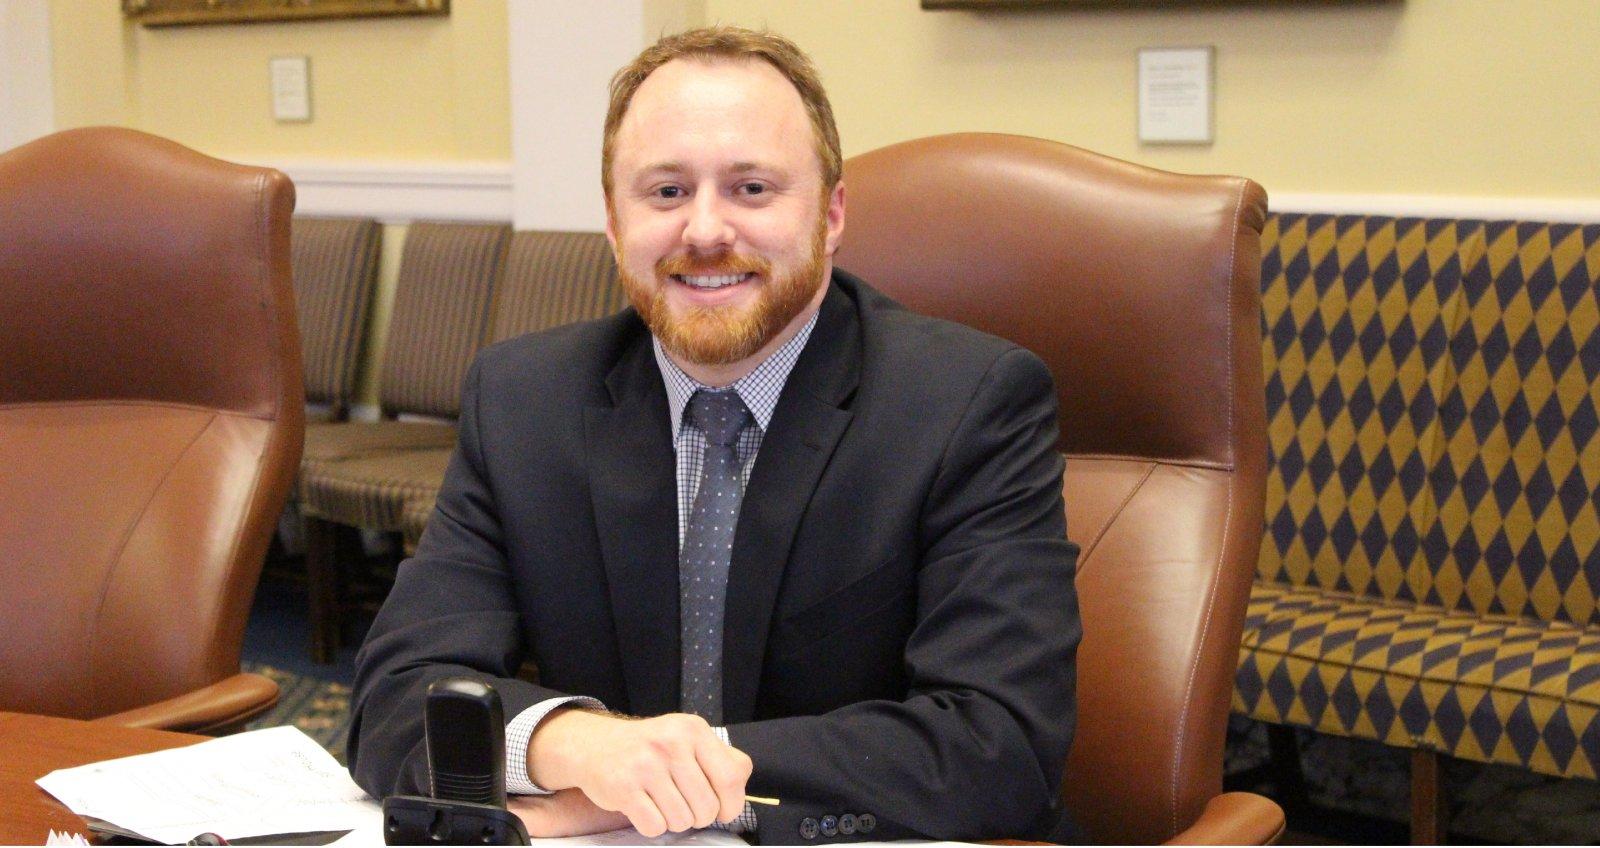 Nate Libby District 21 Sen Nate Libby Maine State Legislature